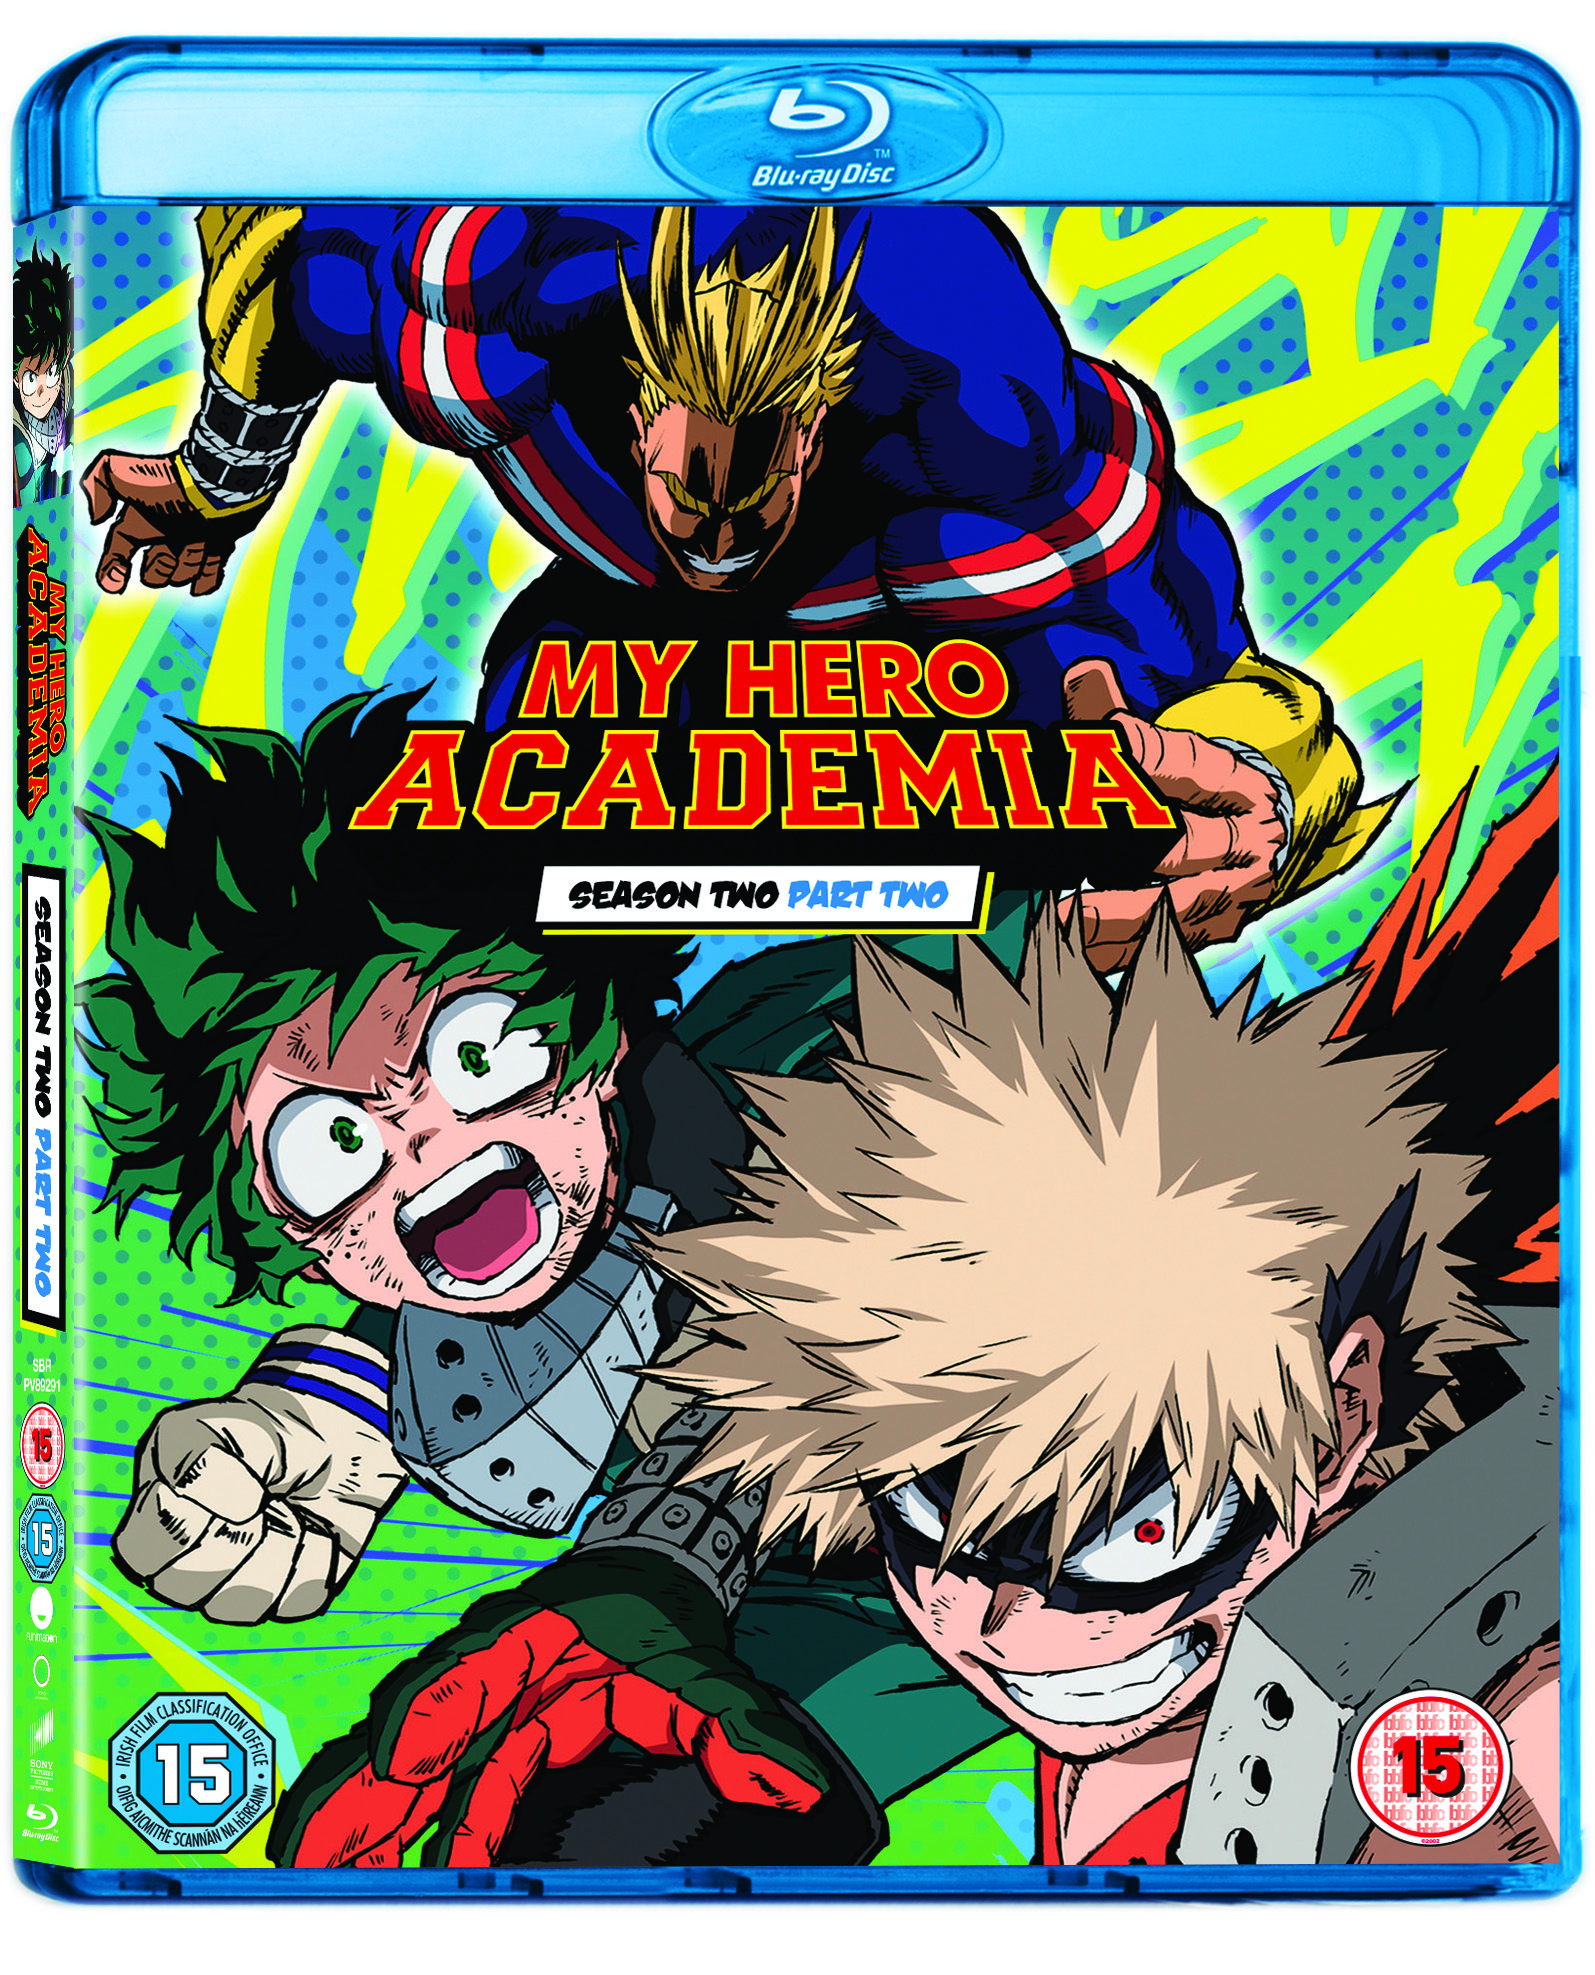 My Hero Academia Two Heroes: My Hero Academia Season Two, Part Two